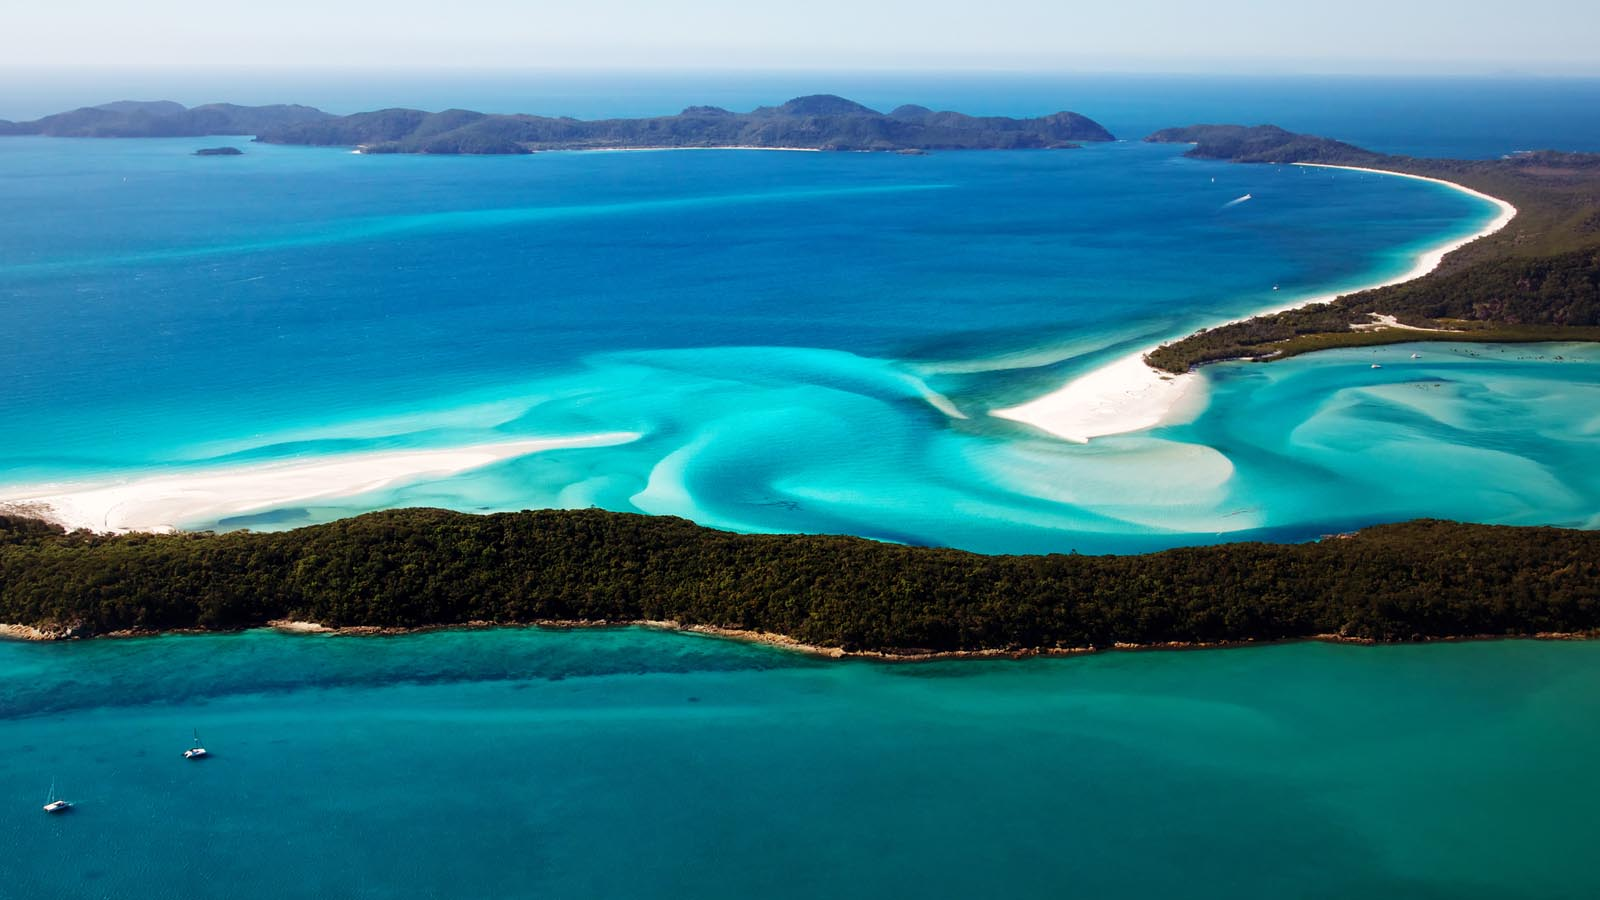 Airlie Beach, Whitsundays Catamaran Cruise & Sydney